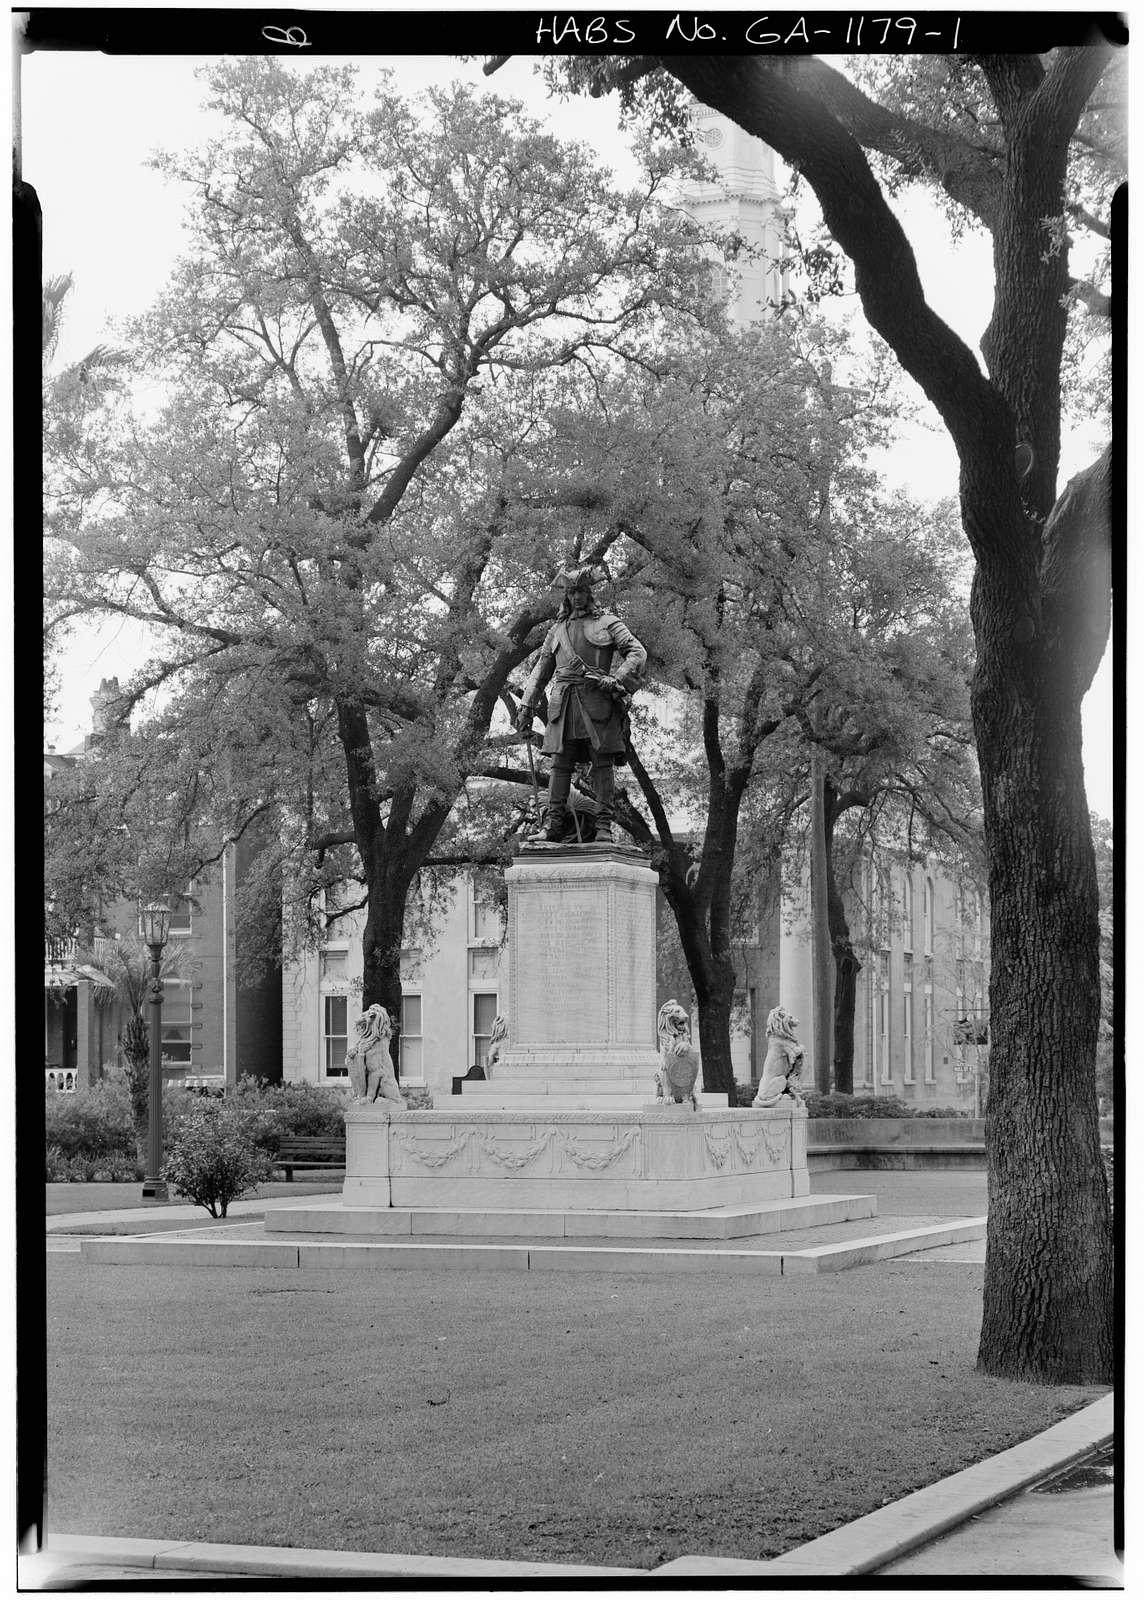 Chippewa Square Monument, Savannah, Chatham County, GA